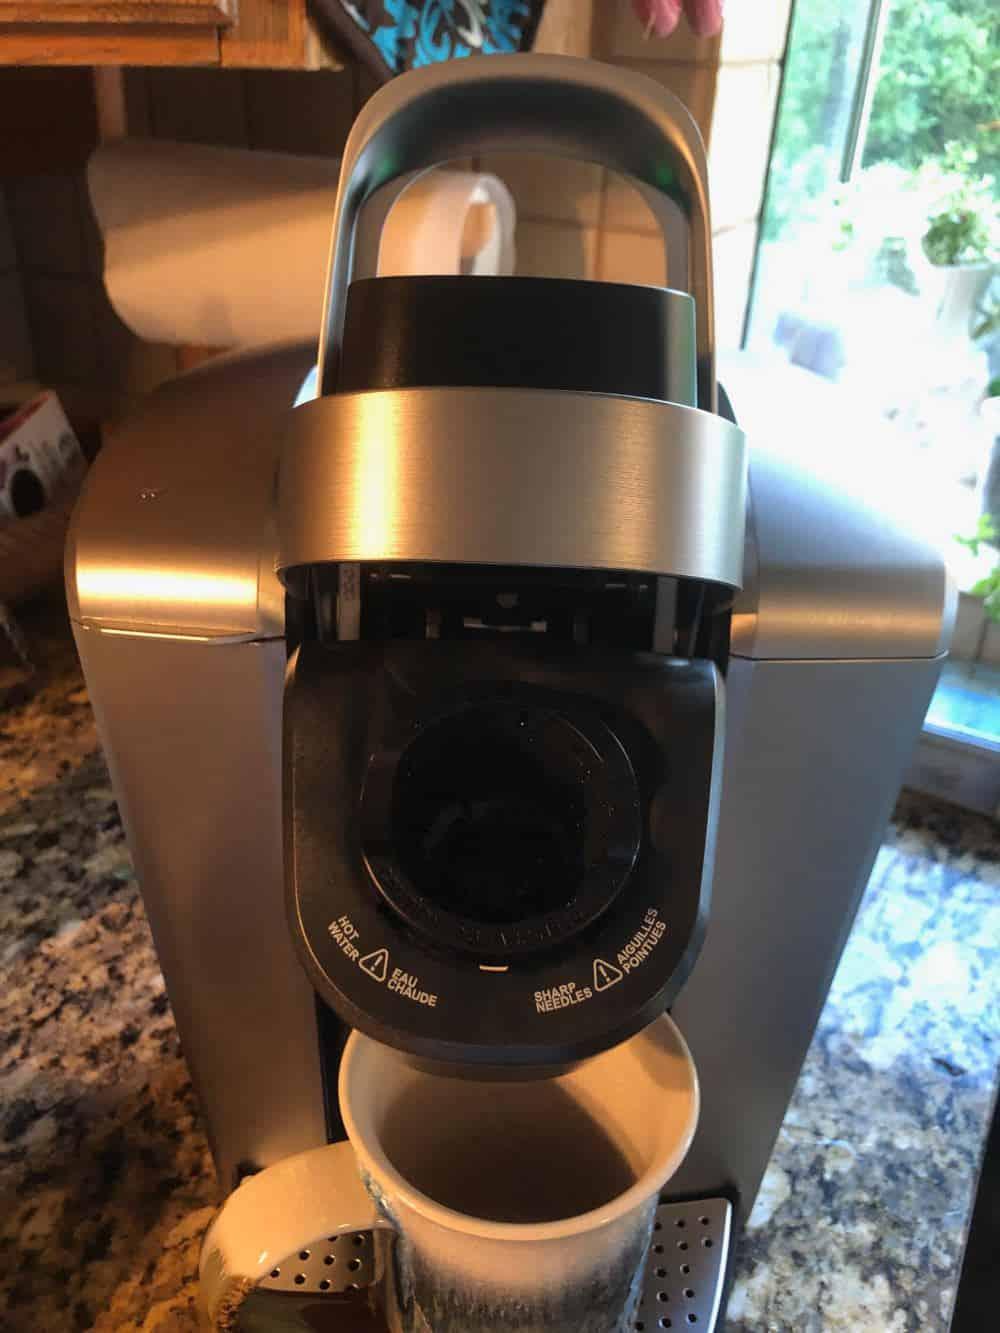 Photo of k-cup holder for Keurig K-Elite coffee maker